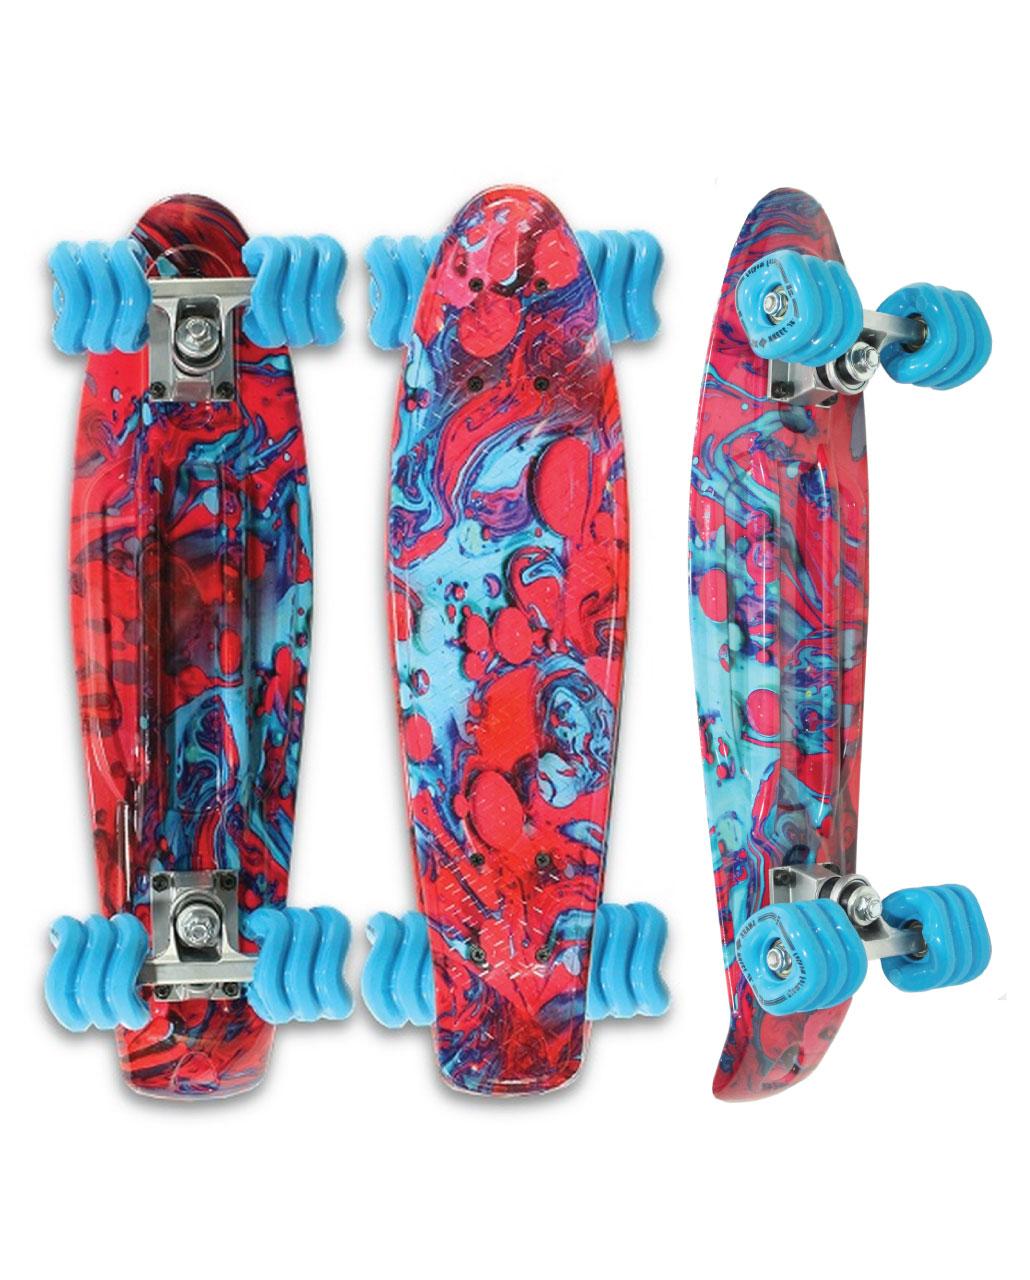 Hypnotic 22'' Skateboard by Shark Wheel